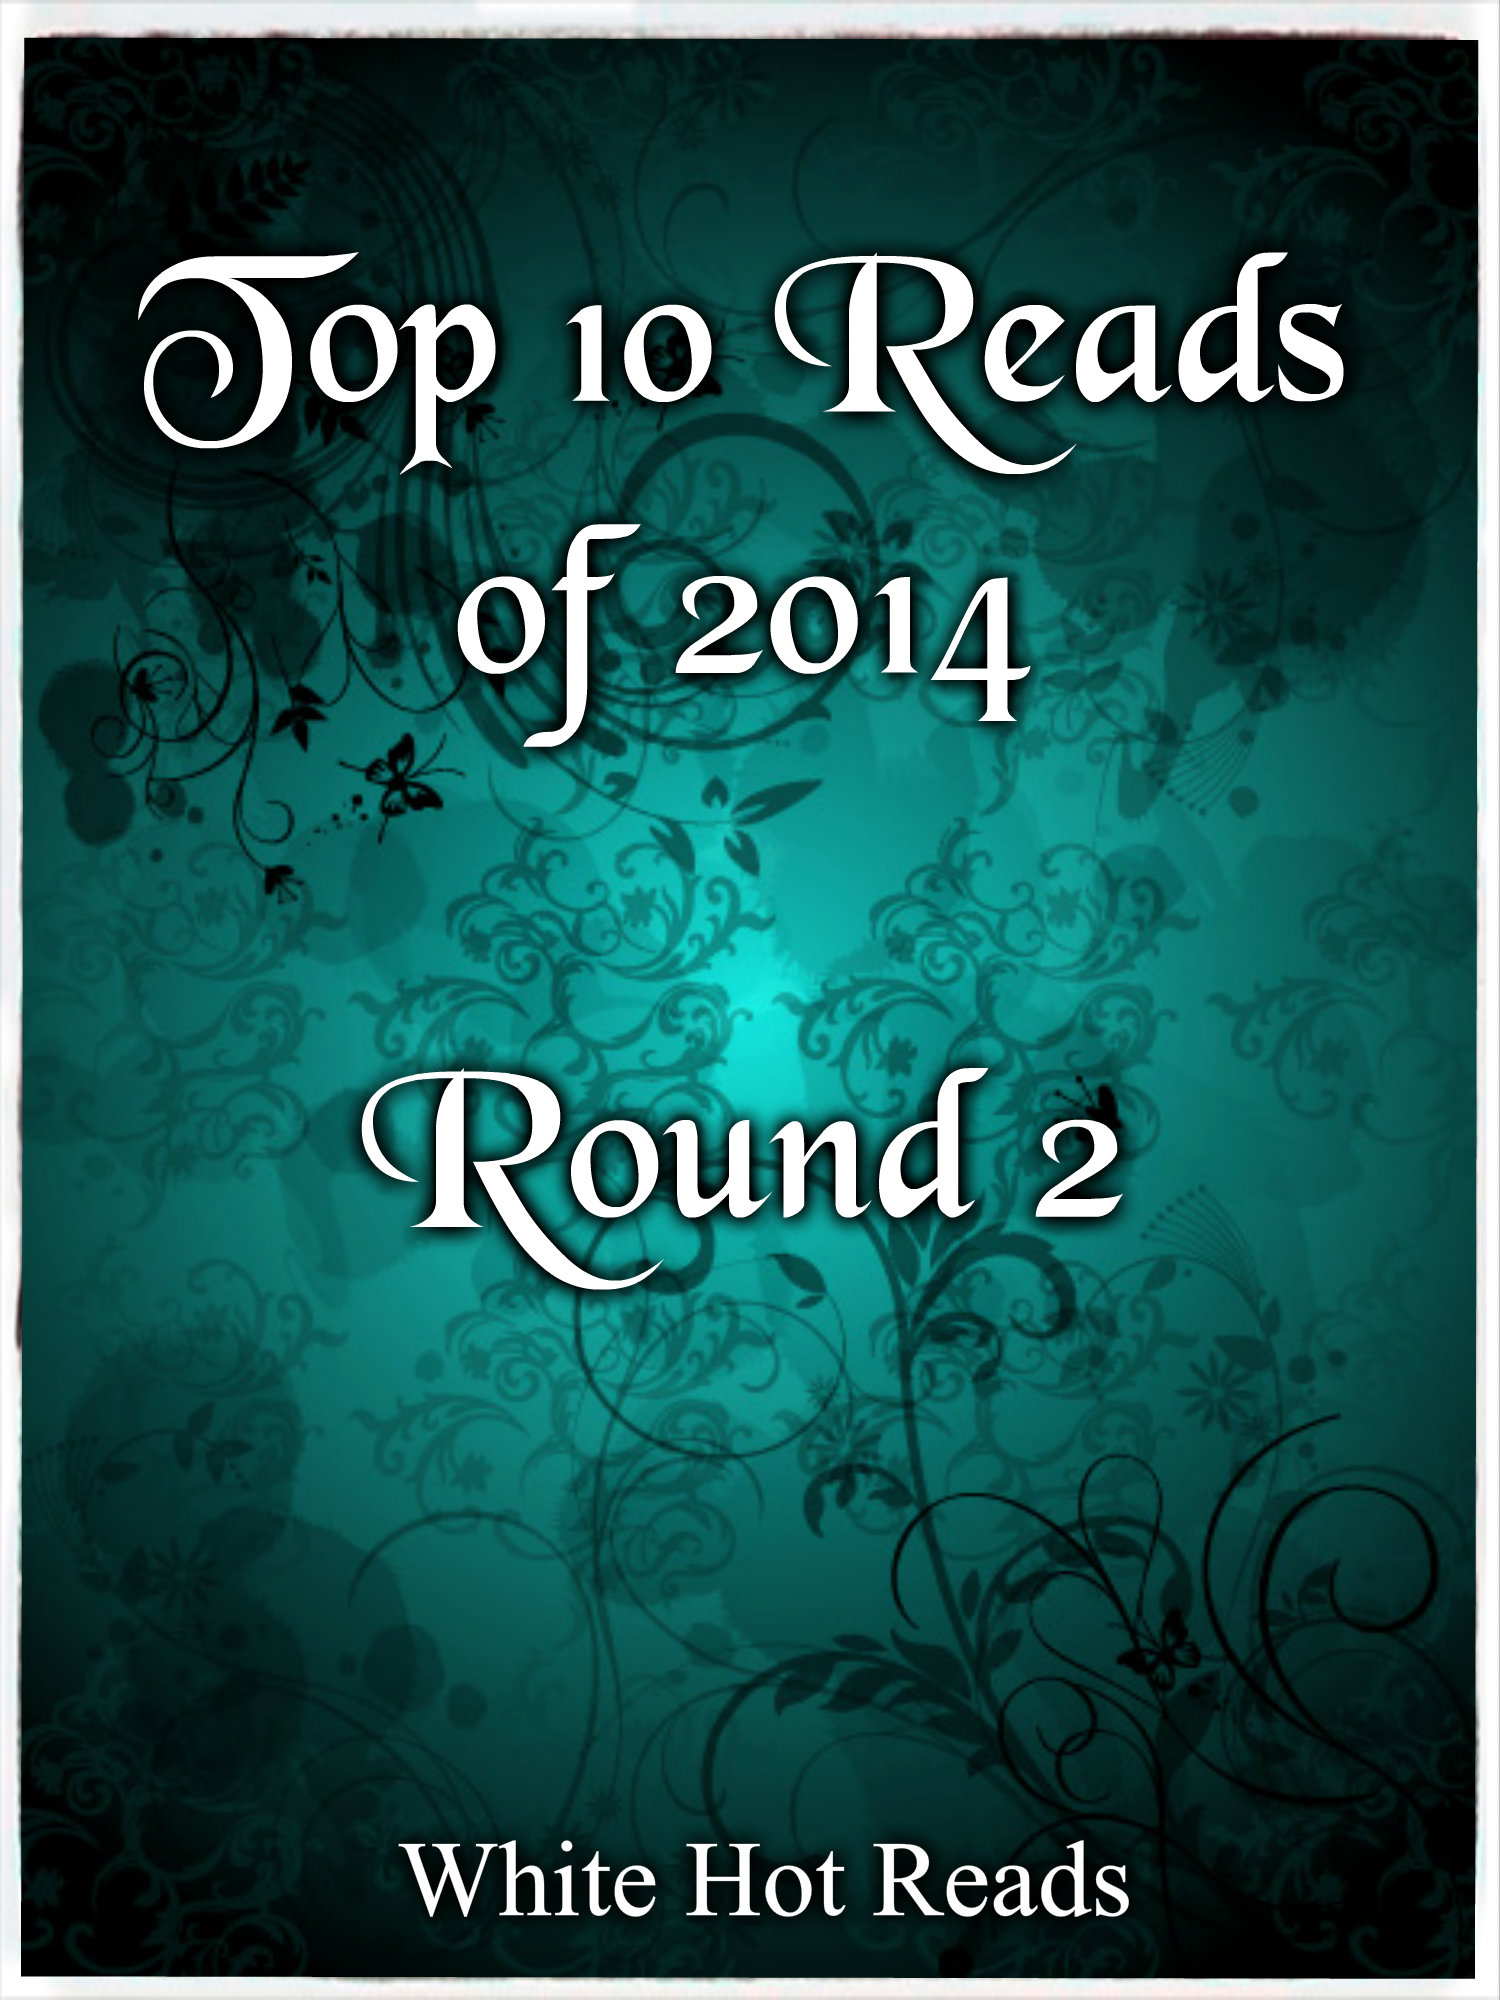 Top 10 Round 2